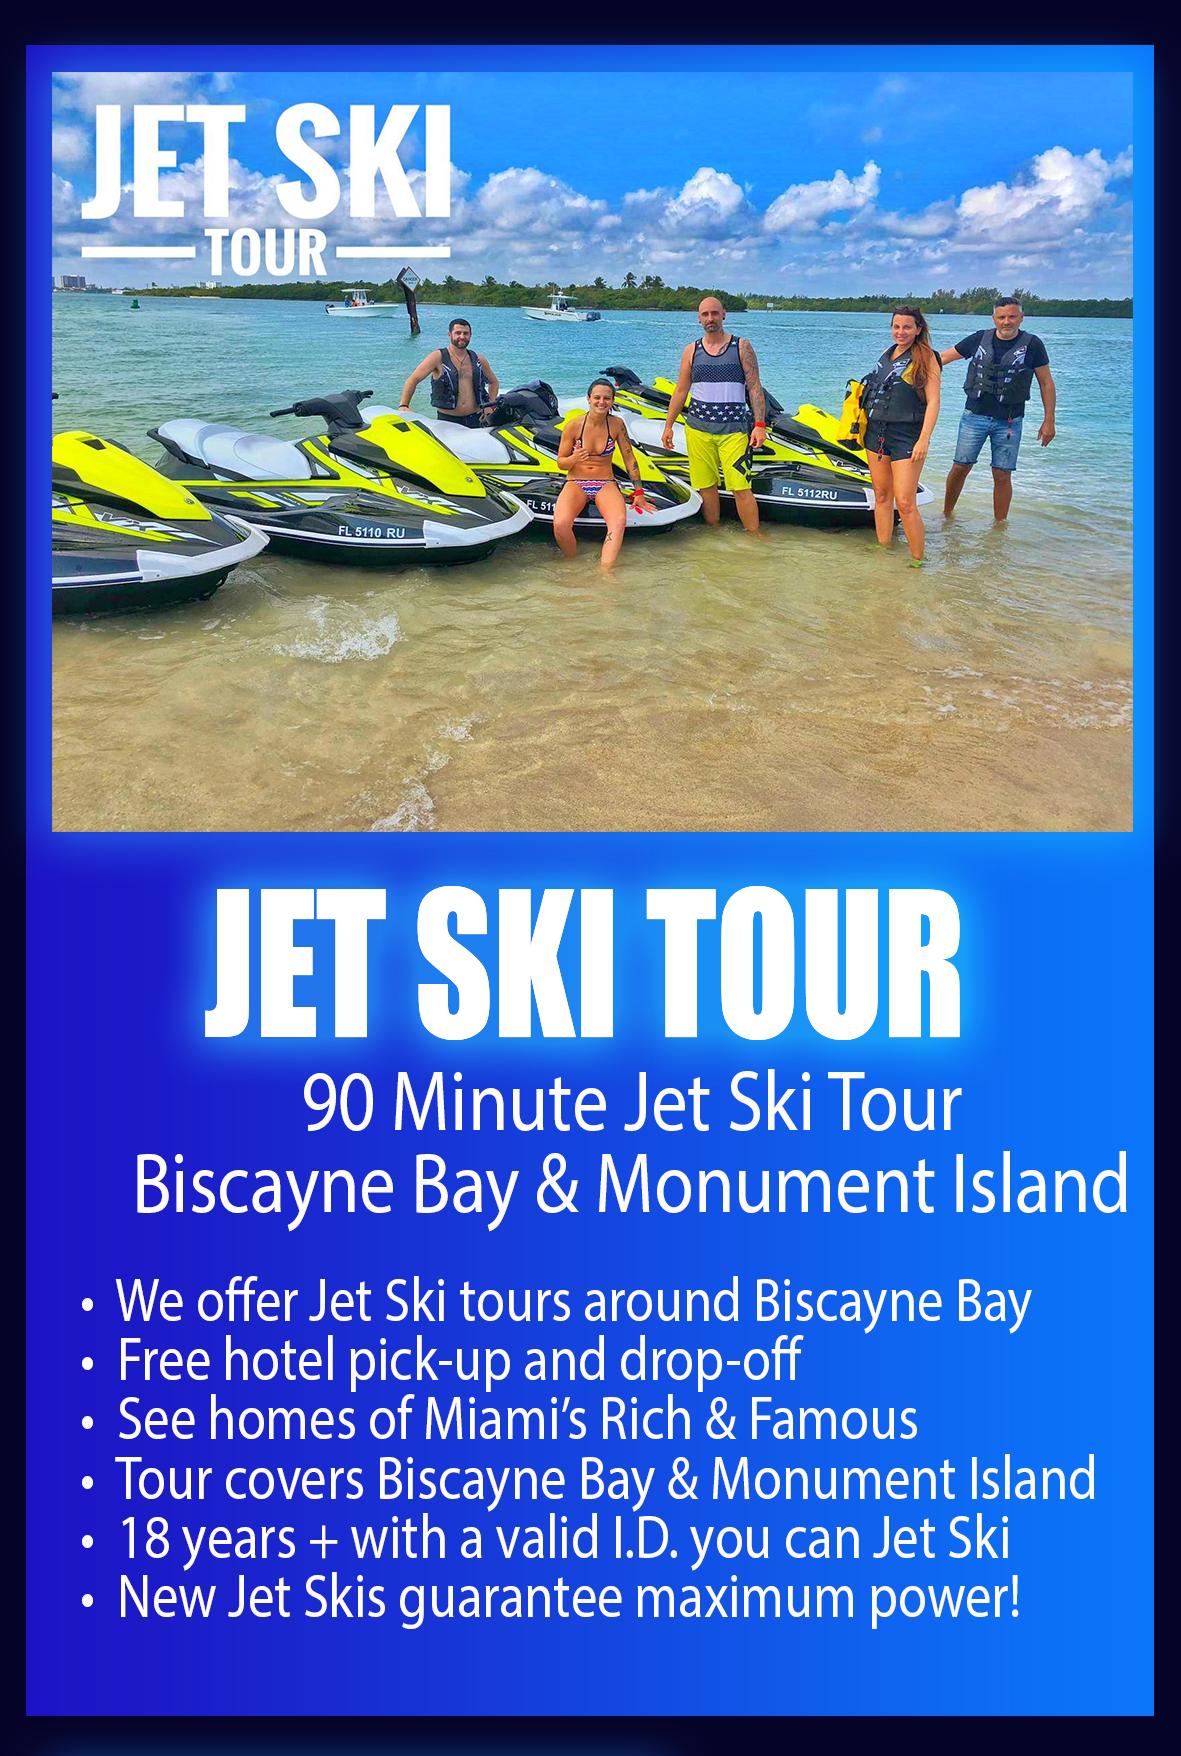 mdd-extreme-jet-ski-90-minute-tour.png